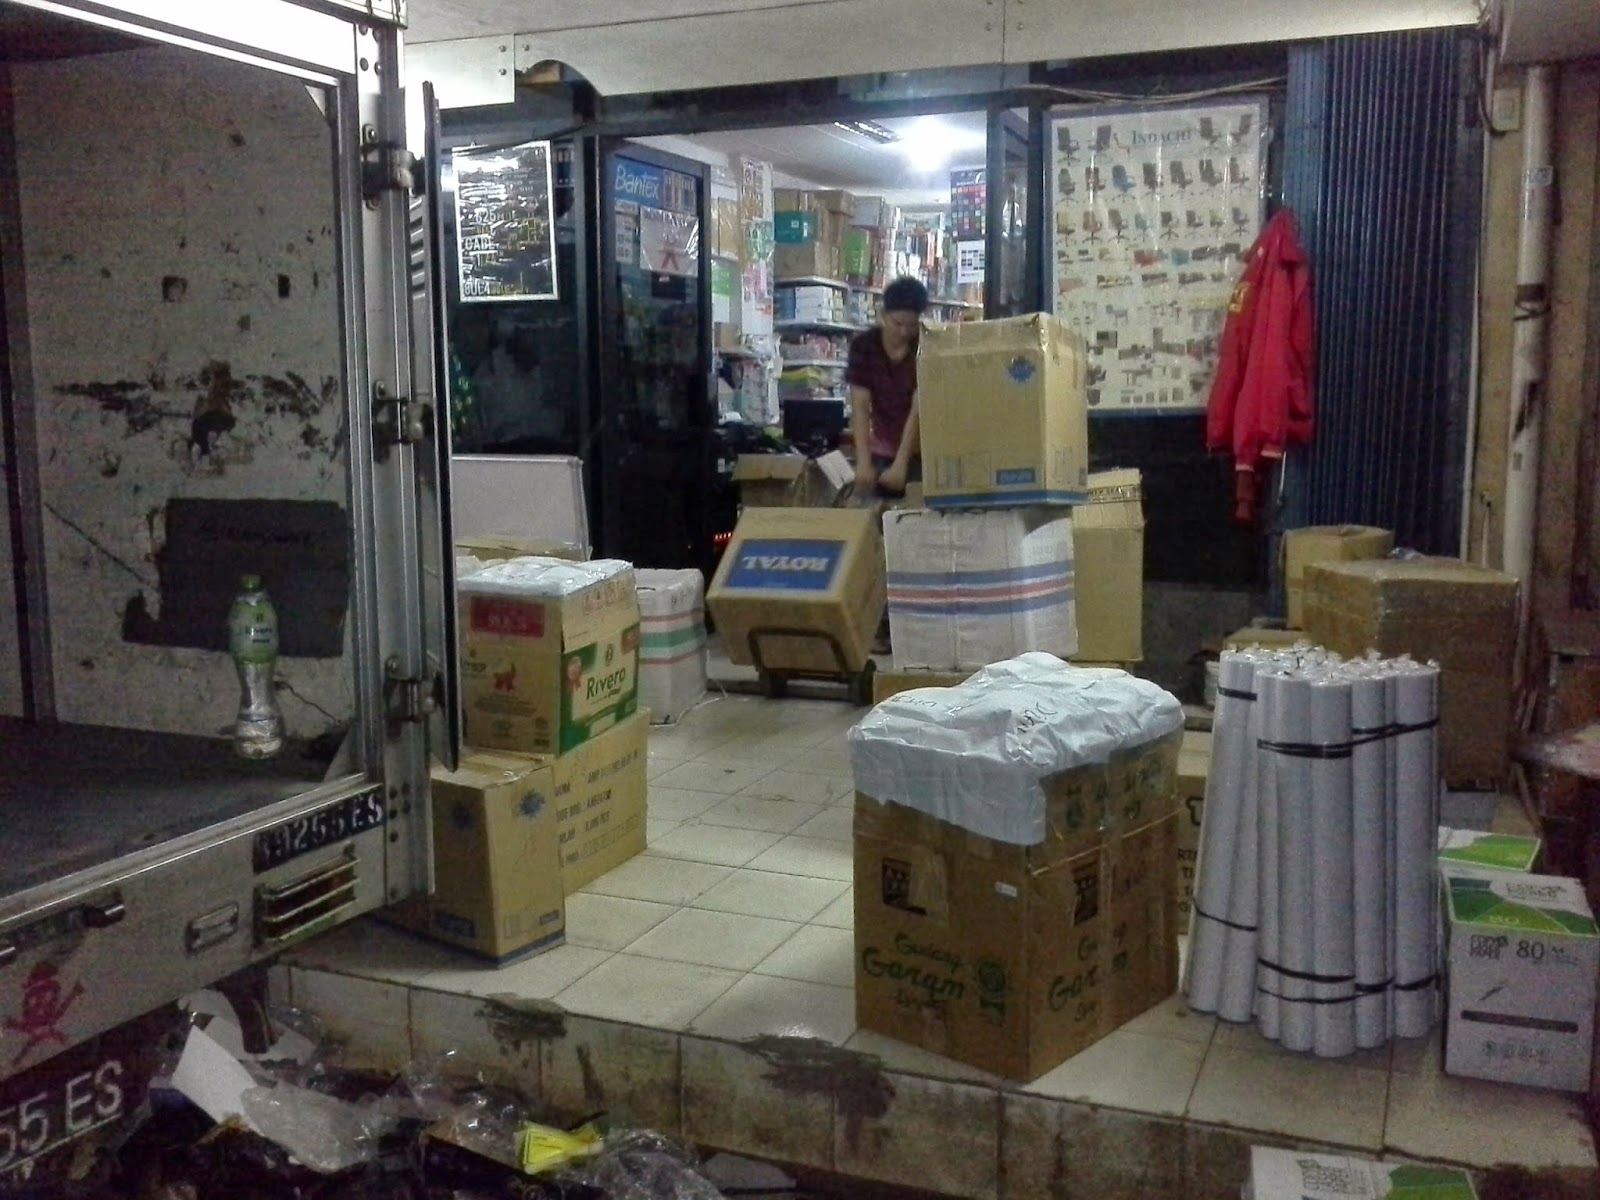 www.hargaalattuliskantor.com : Toko  ATK Sedia Price List Stationery Murah